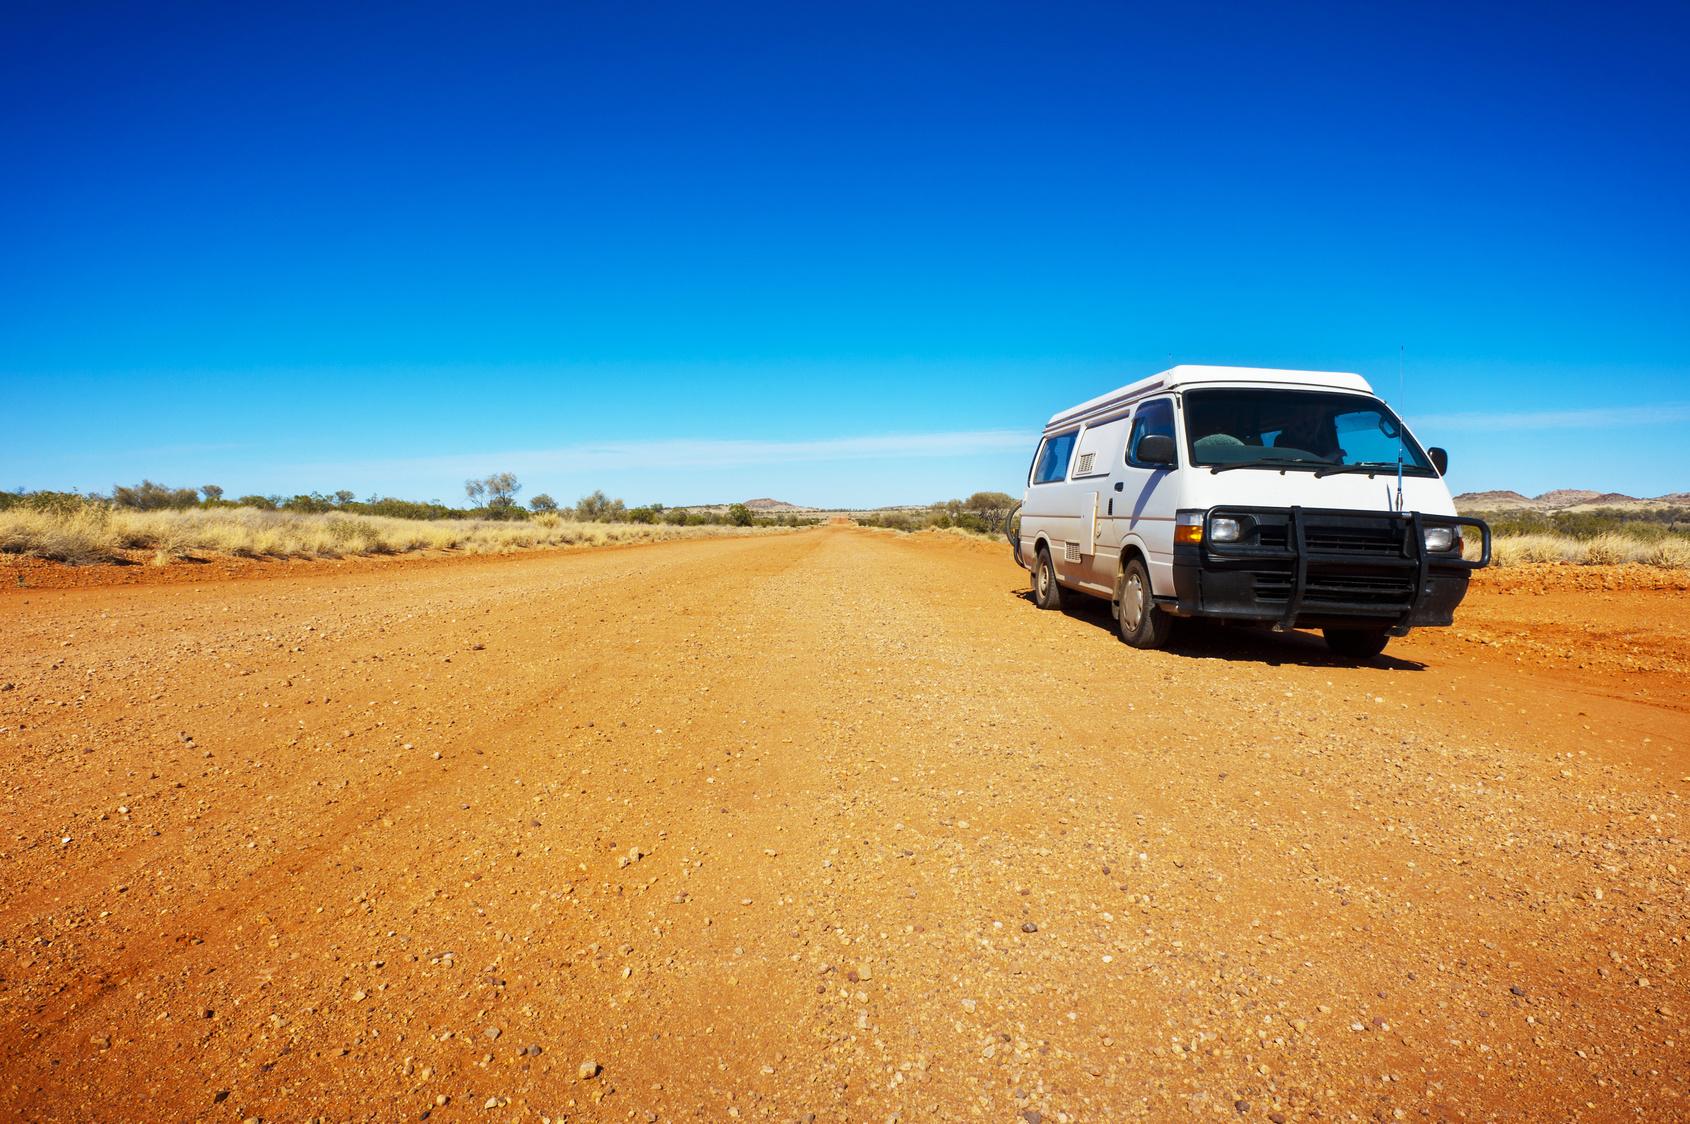 acheter véhicule australie